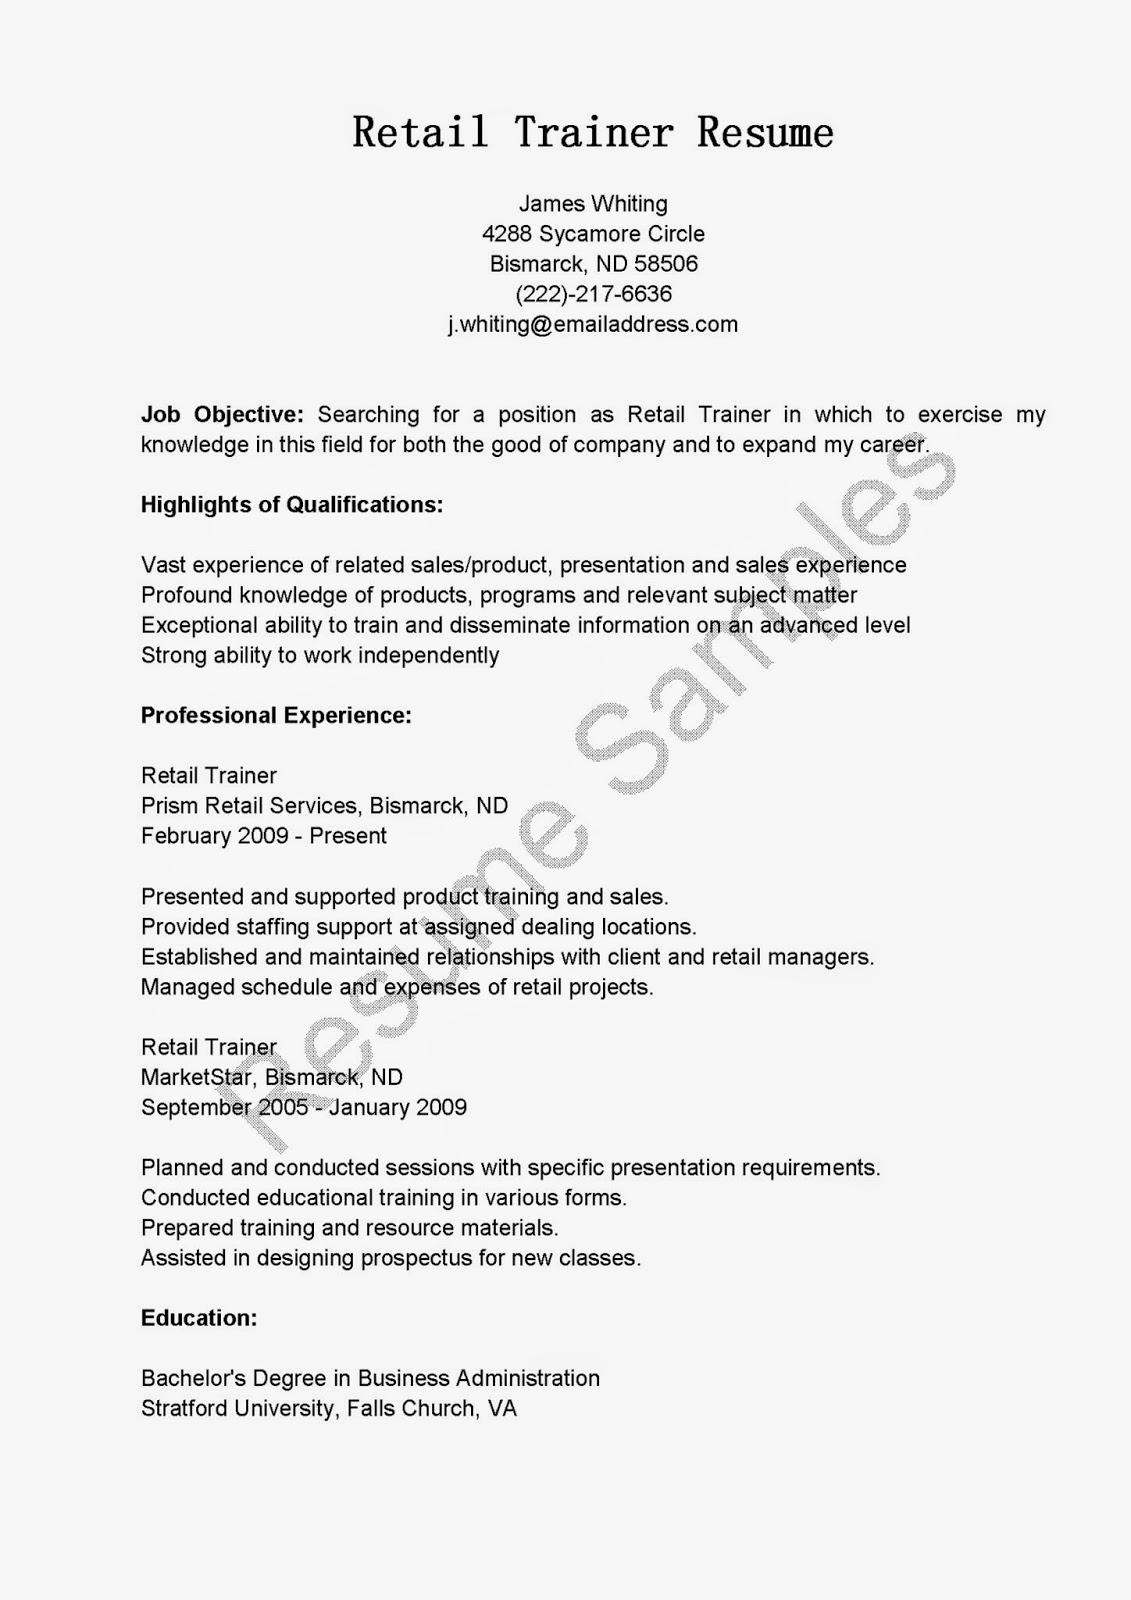 resume samples retail trainer resume sample